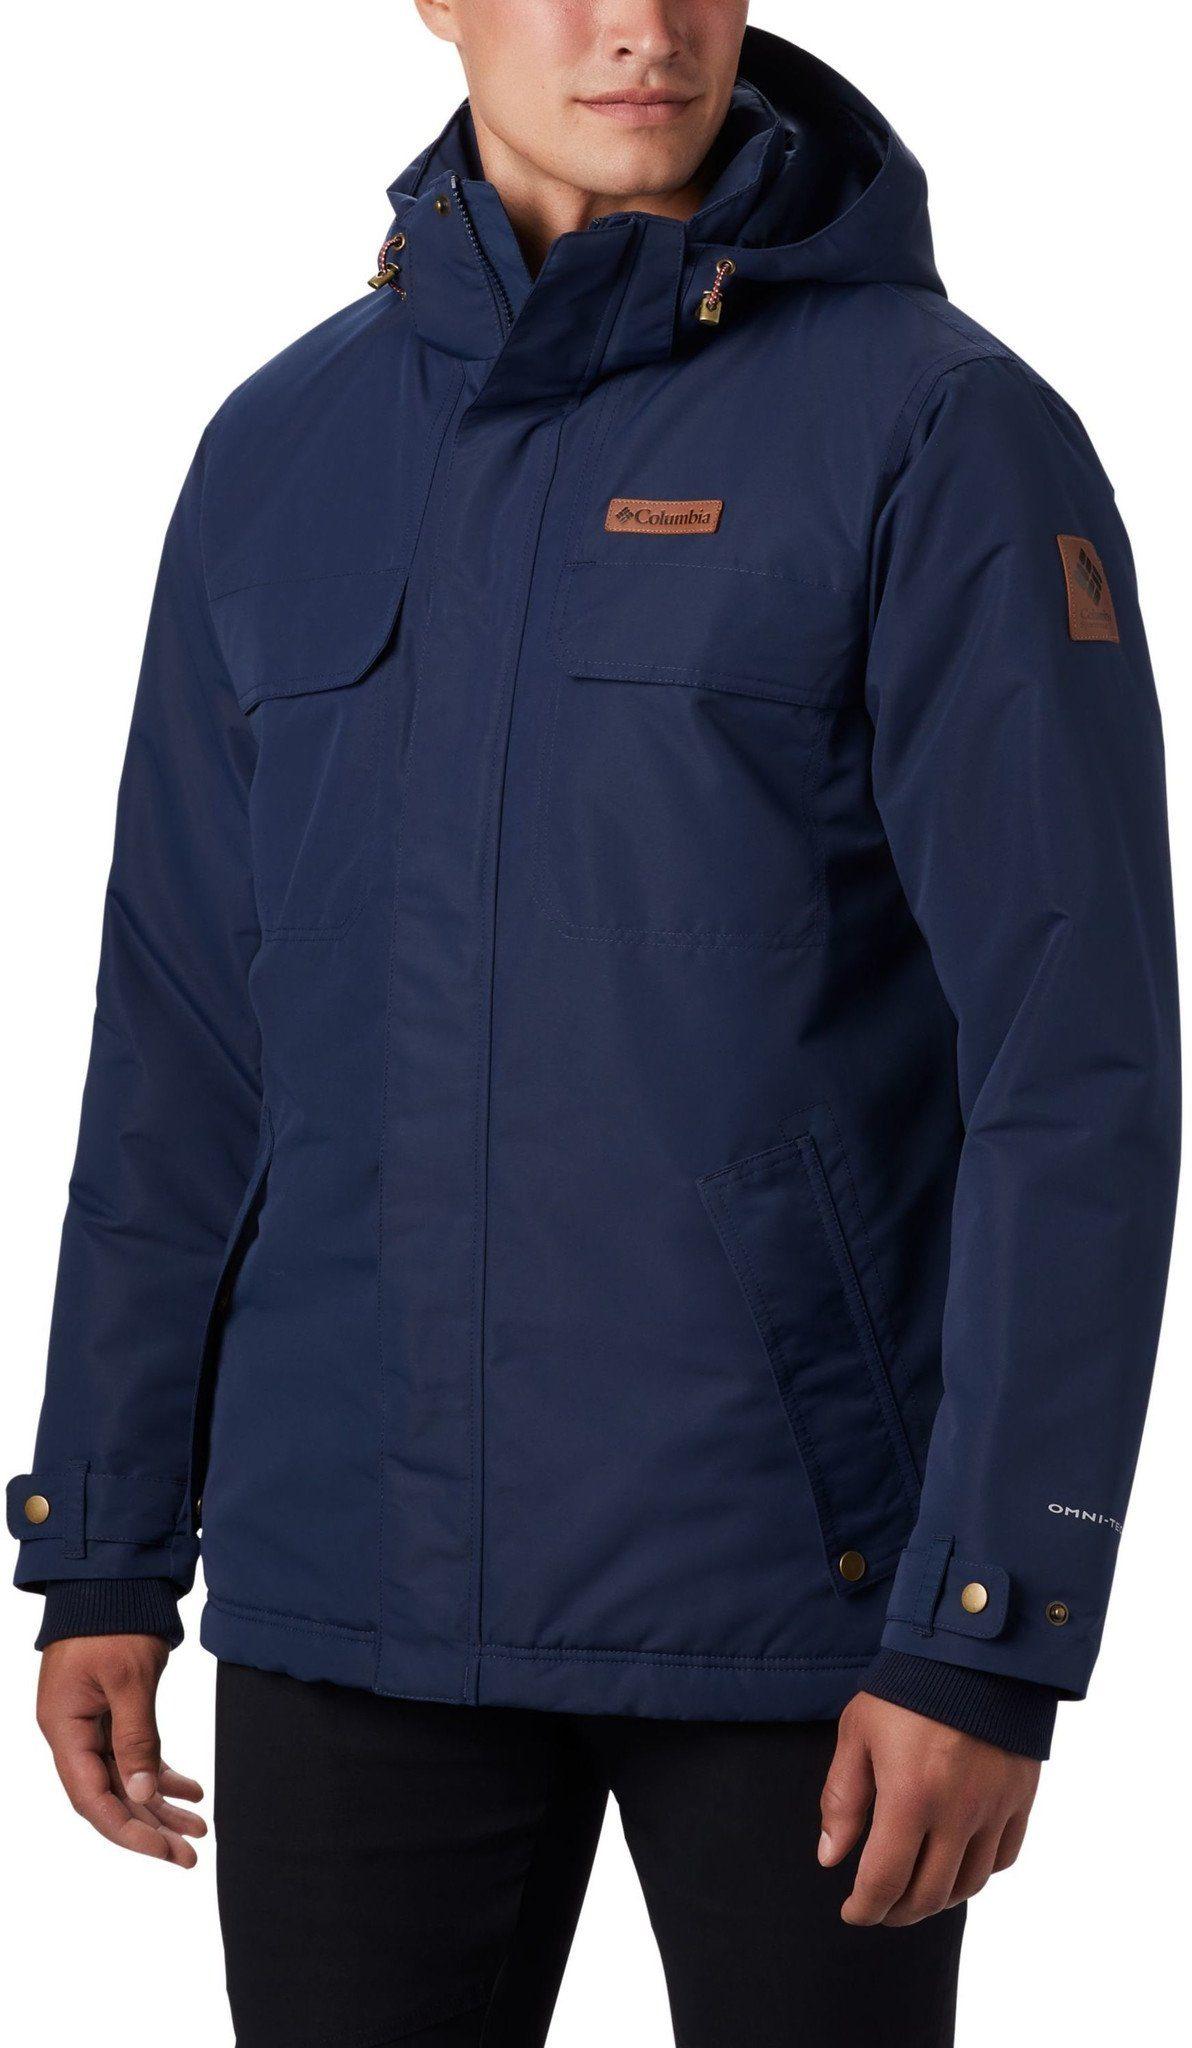 Columbia Outdoorjacke »Rugged Path Jacket Herren«   OTTO